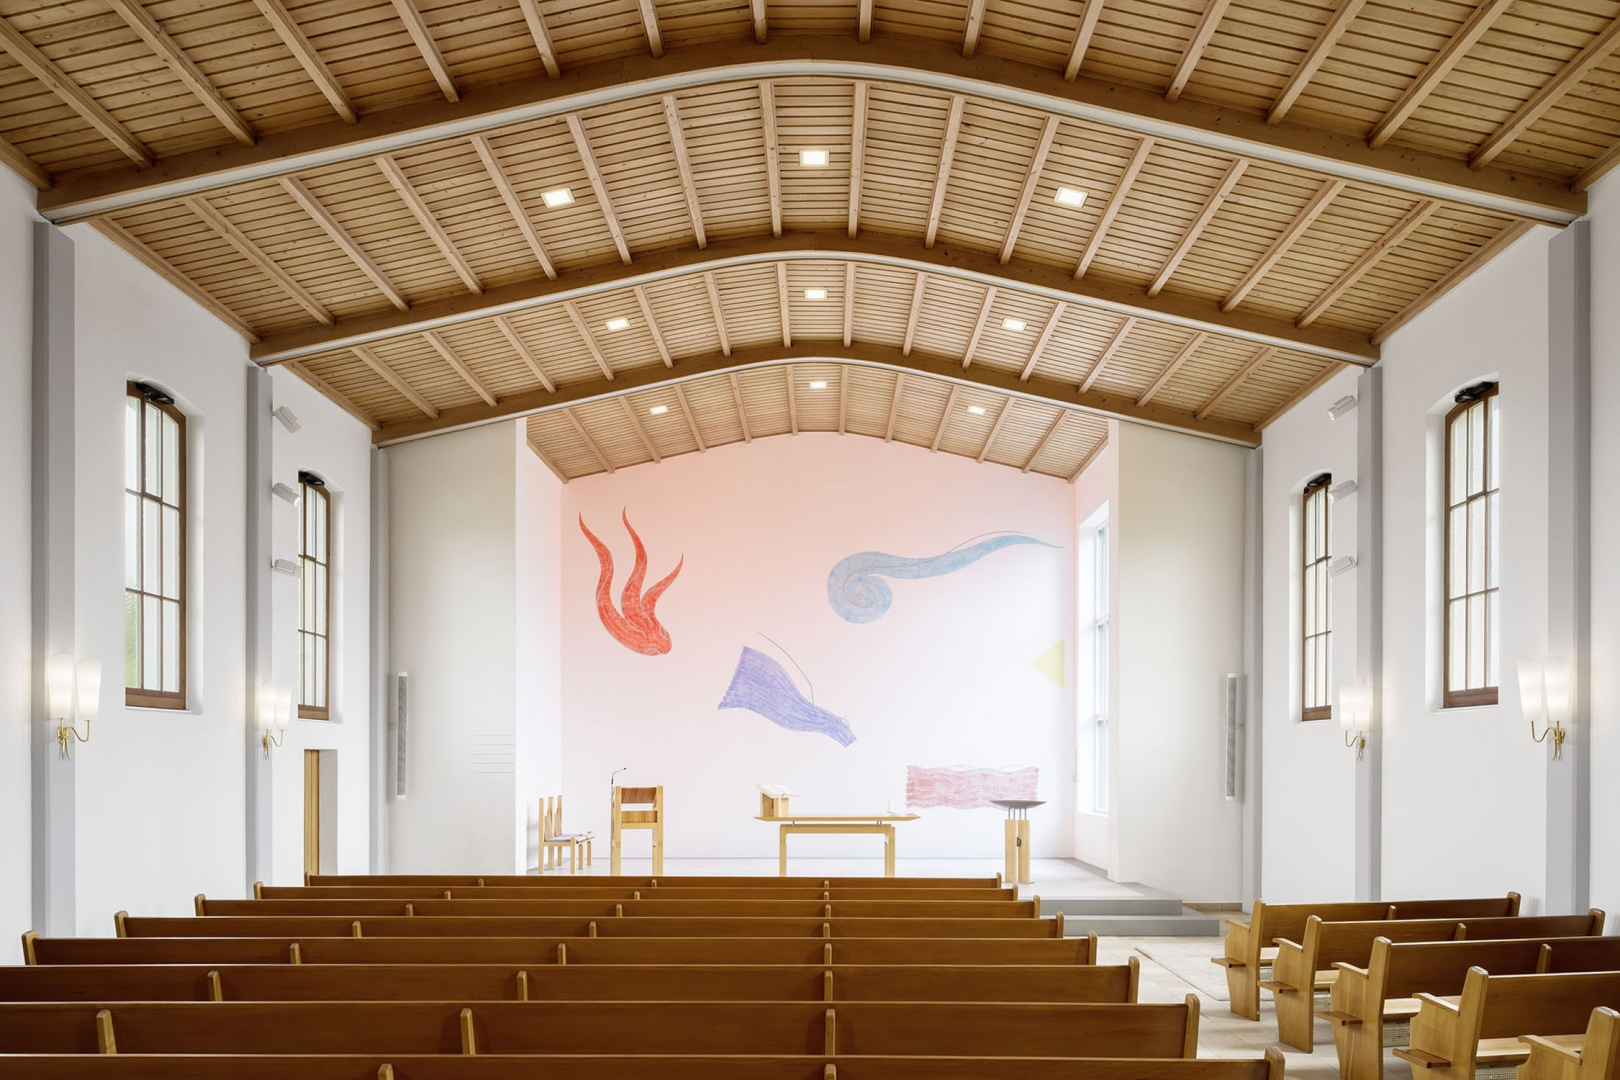 Kirchenschiff © Michael Egloff, michaelegloff.ch